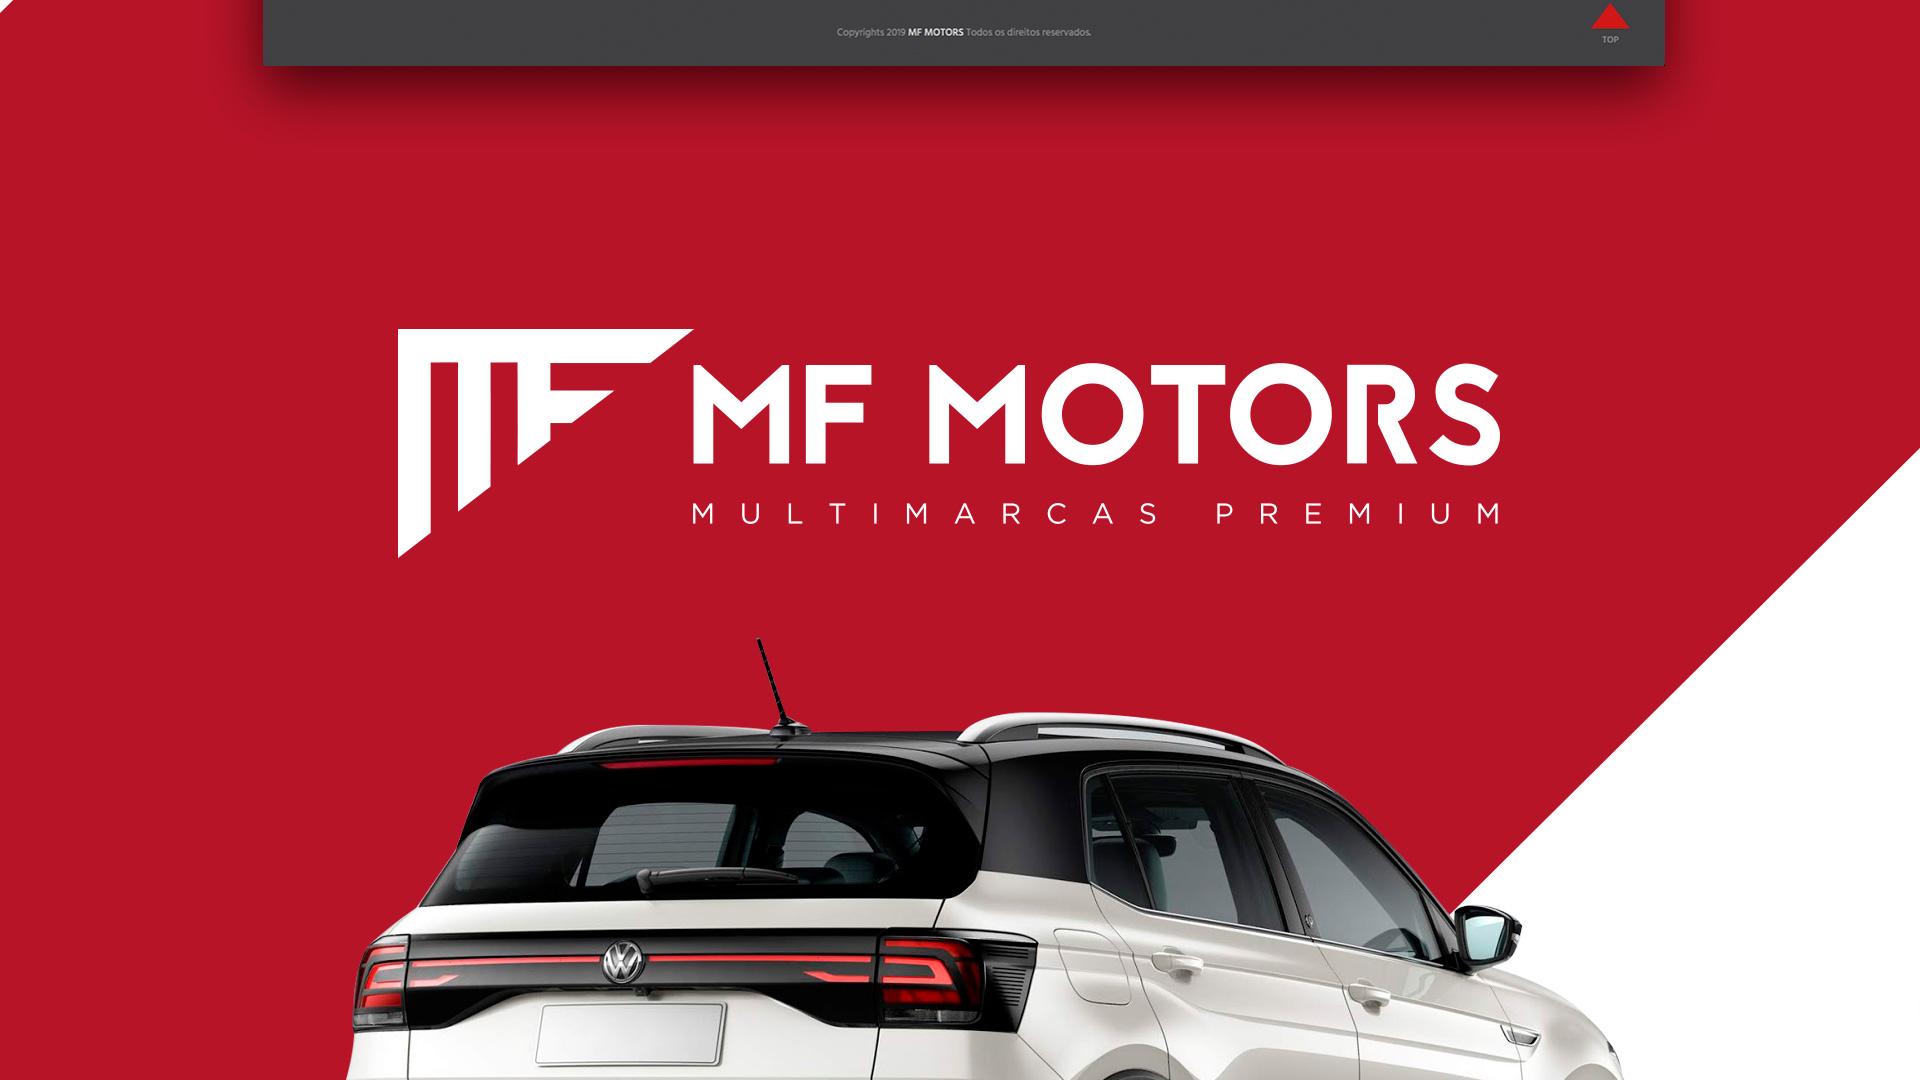 MF MOTORS